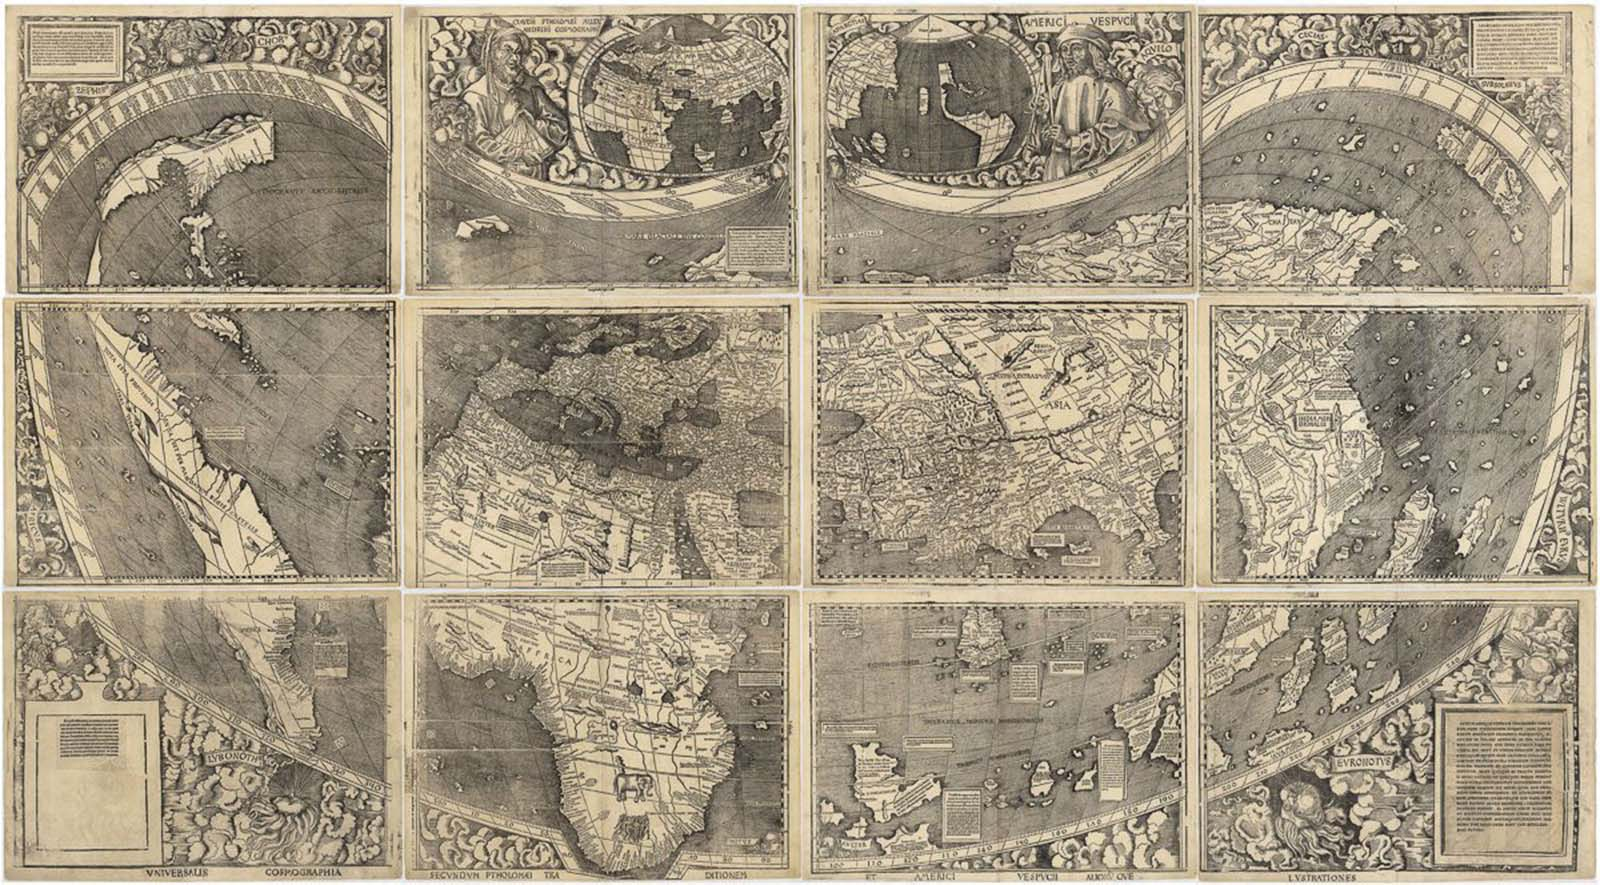 waldseemuller map america